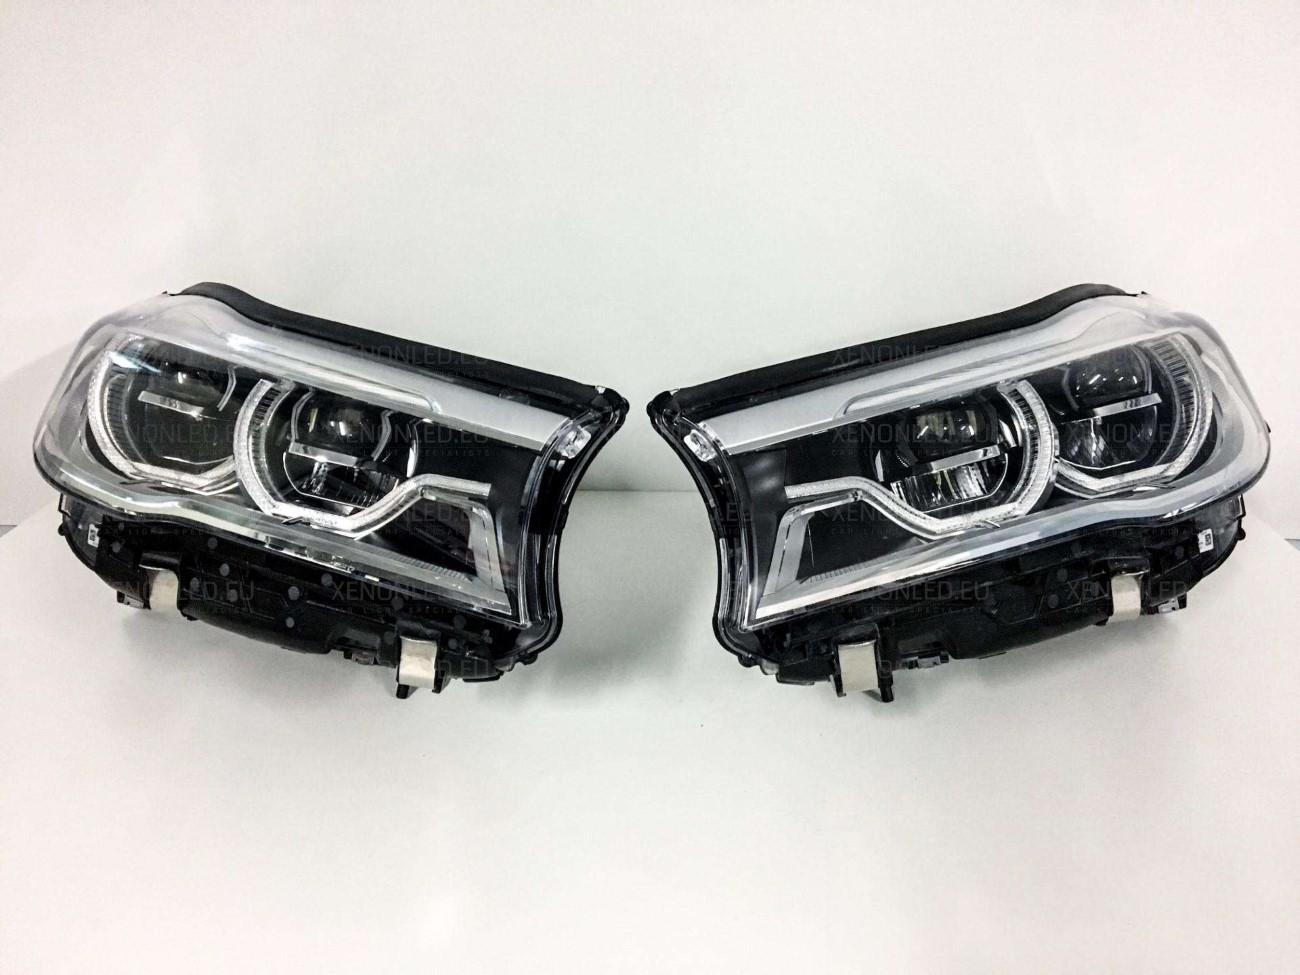 Bmw 7 Series G11 G12 2015 Adaptive Led Headlights Xenonled Eu